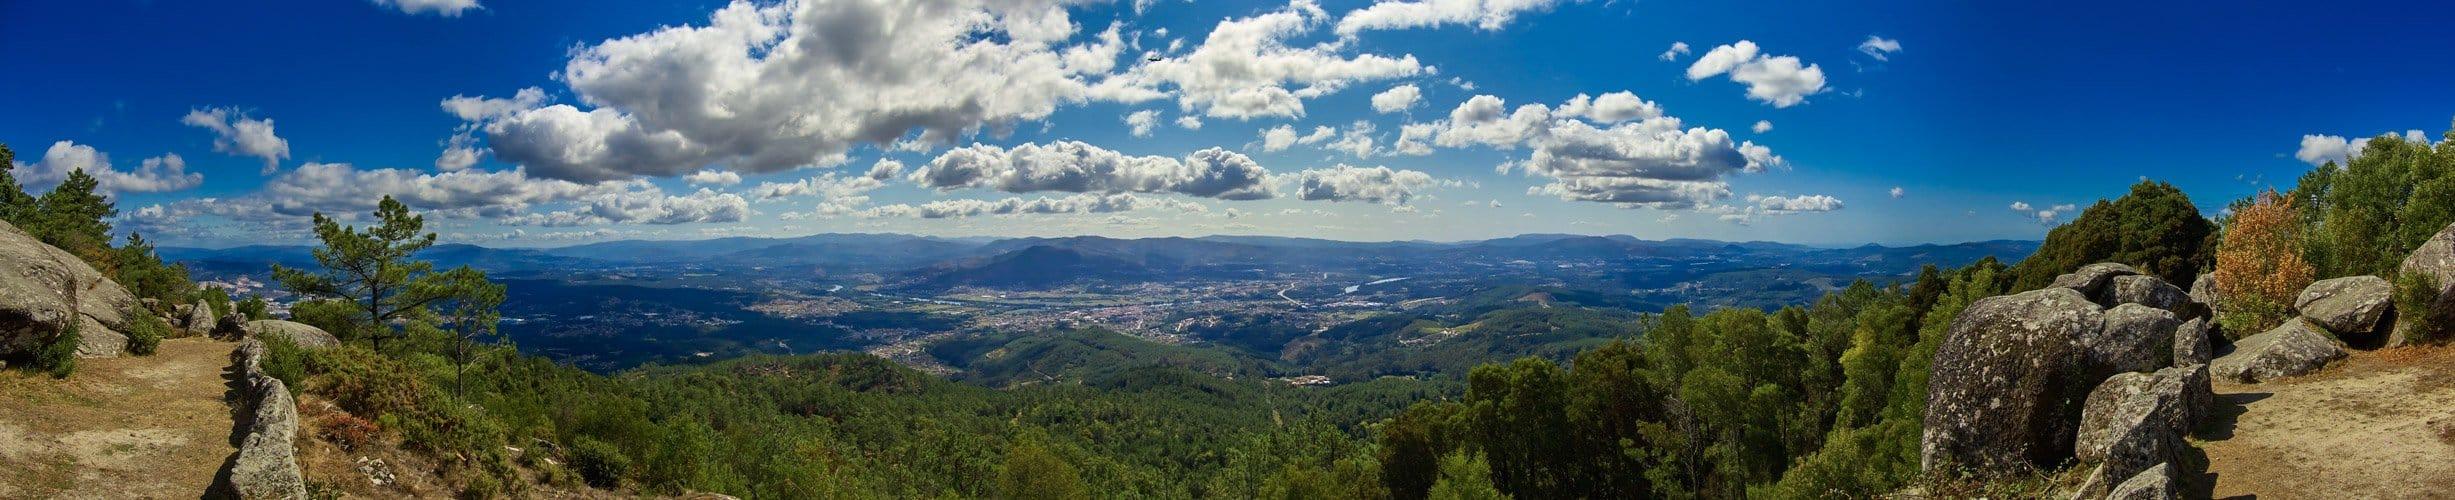 Monte Aloia - Tui